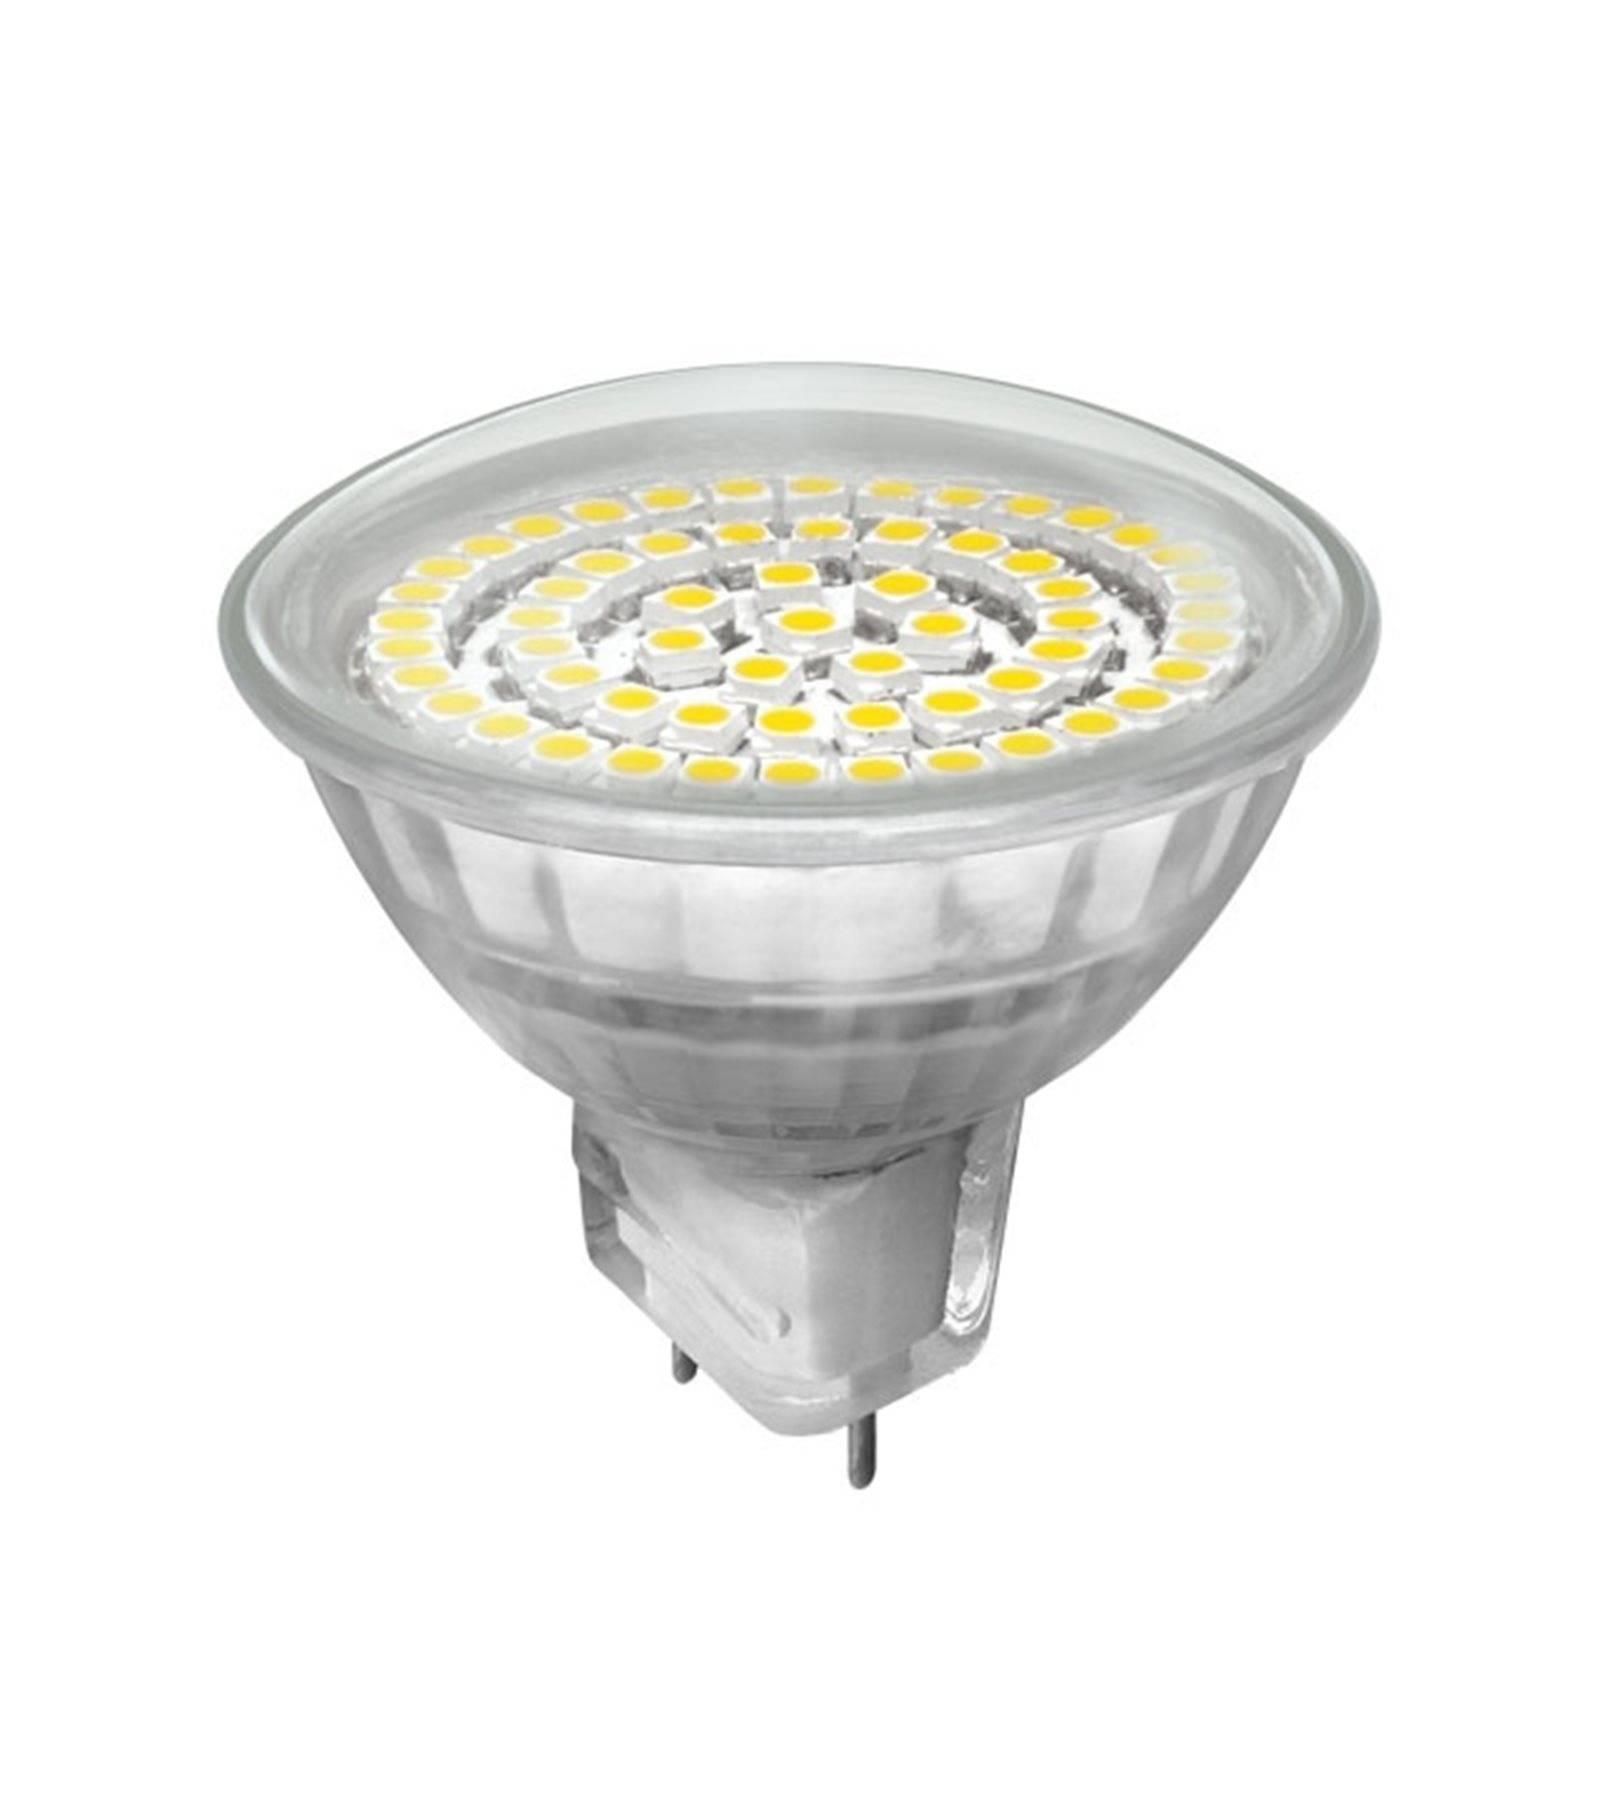 ampoule led gu5 3 mr16 r flecteur 60 smd 3 3w 260lm quiv 26w blanc froid 120 12v kanlux. Black Bedroom Furniture Sets. Home Design Ideas